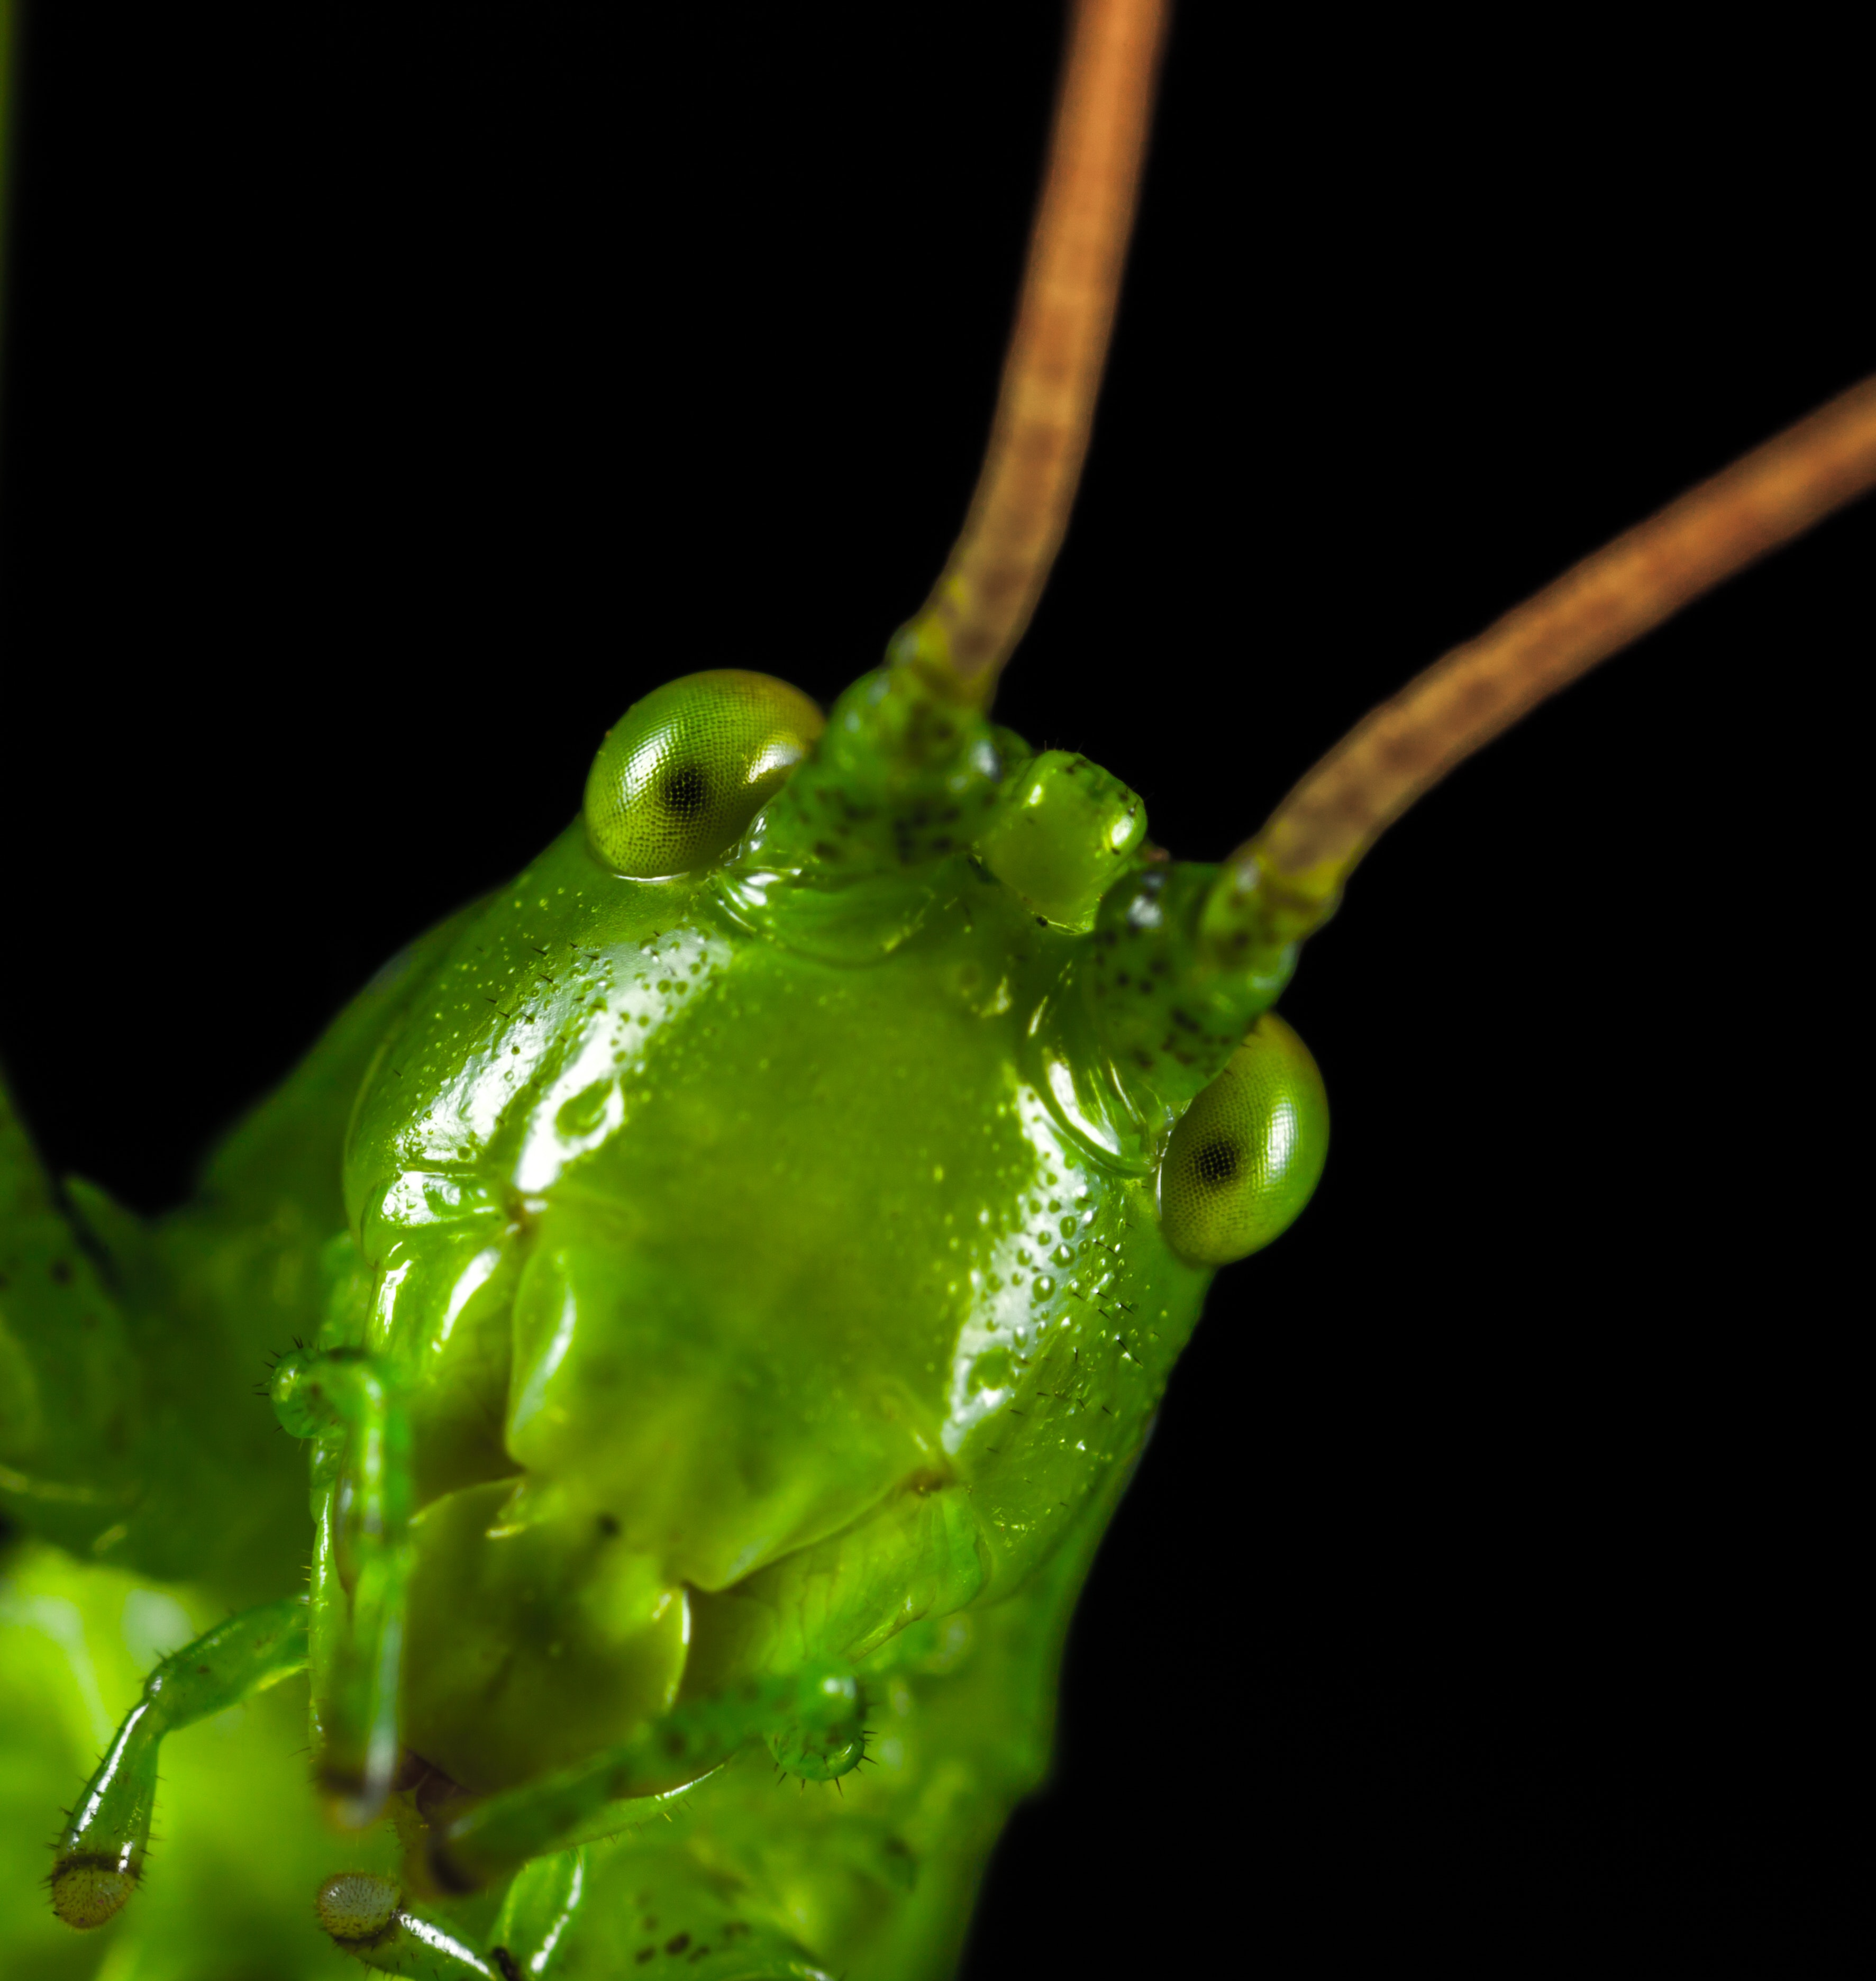 Closeup Photography of Green Grasshopper, Animal, Little, Pest, Outdoors, HQ Photo